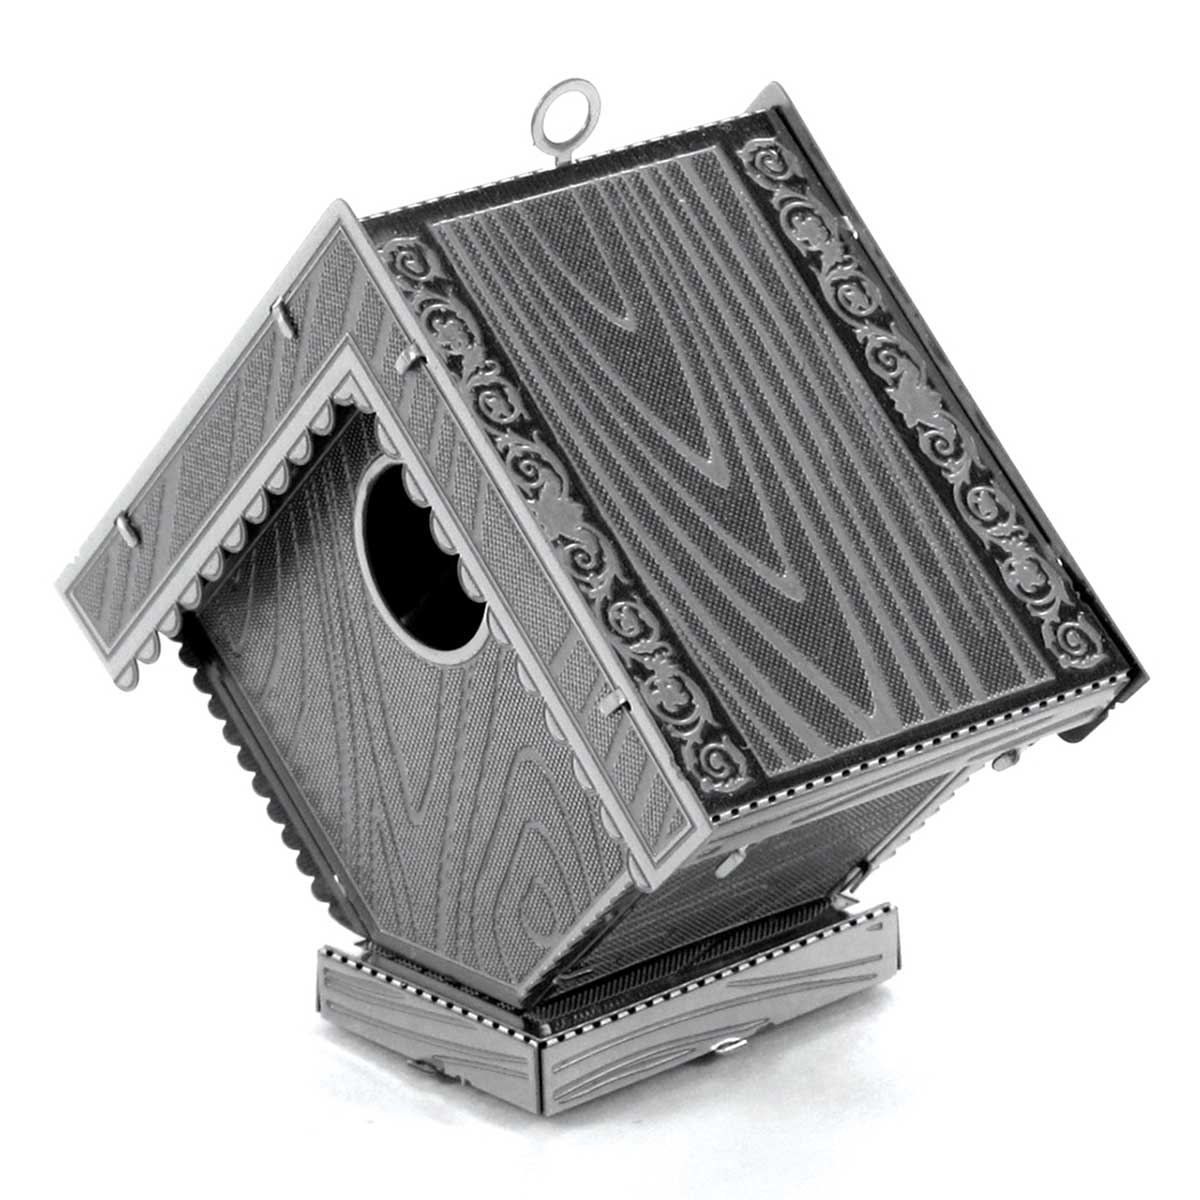 Birdhouse Birds Metal Puzzles